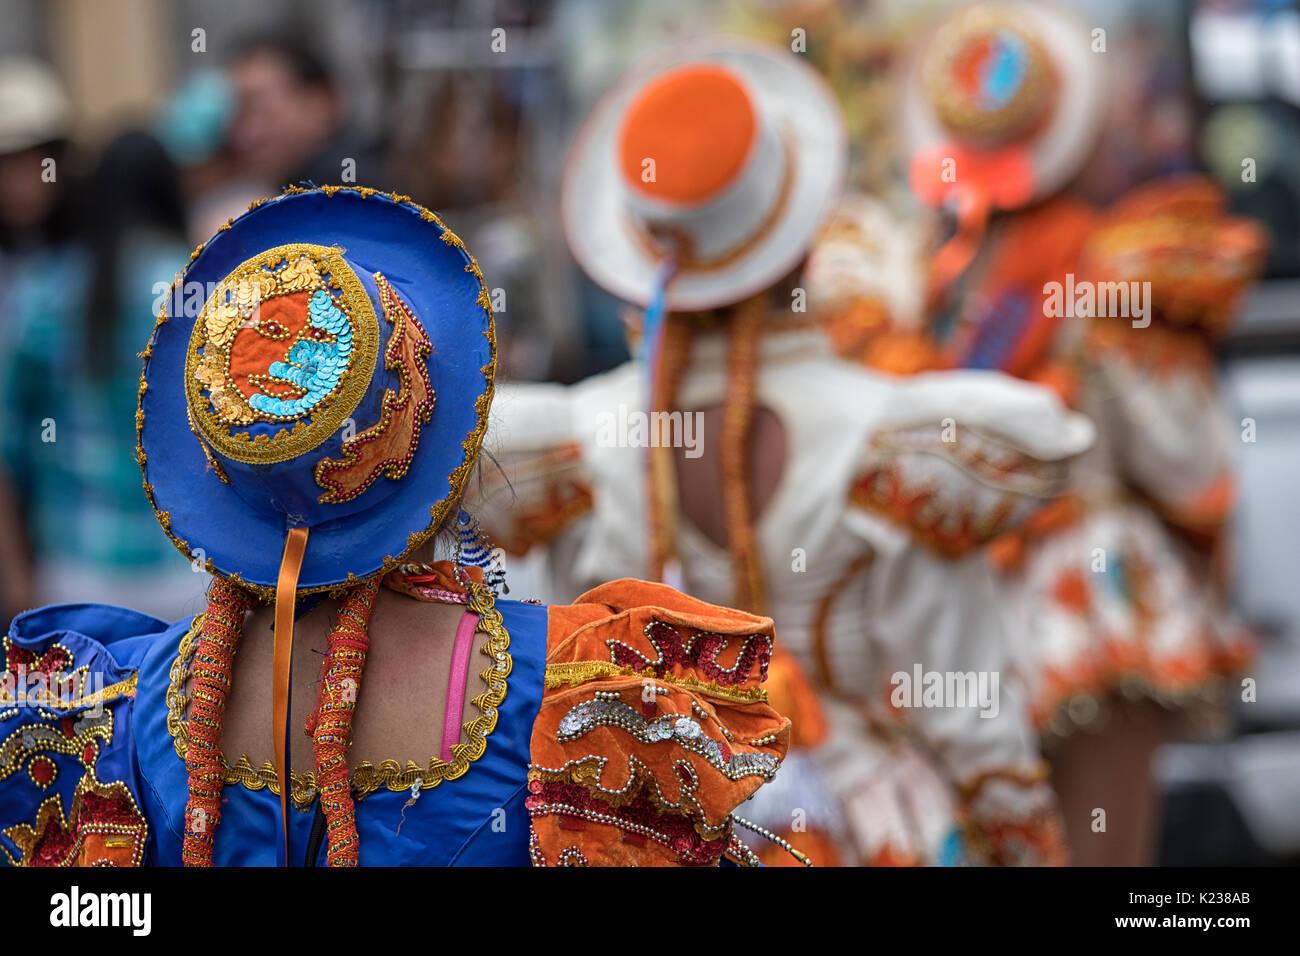 June 17, 2017 Pujili, Ecuador: closeup details of colorful indigenous female costume and hat at Corpus Christi annual parade - Stock Image